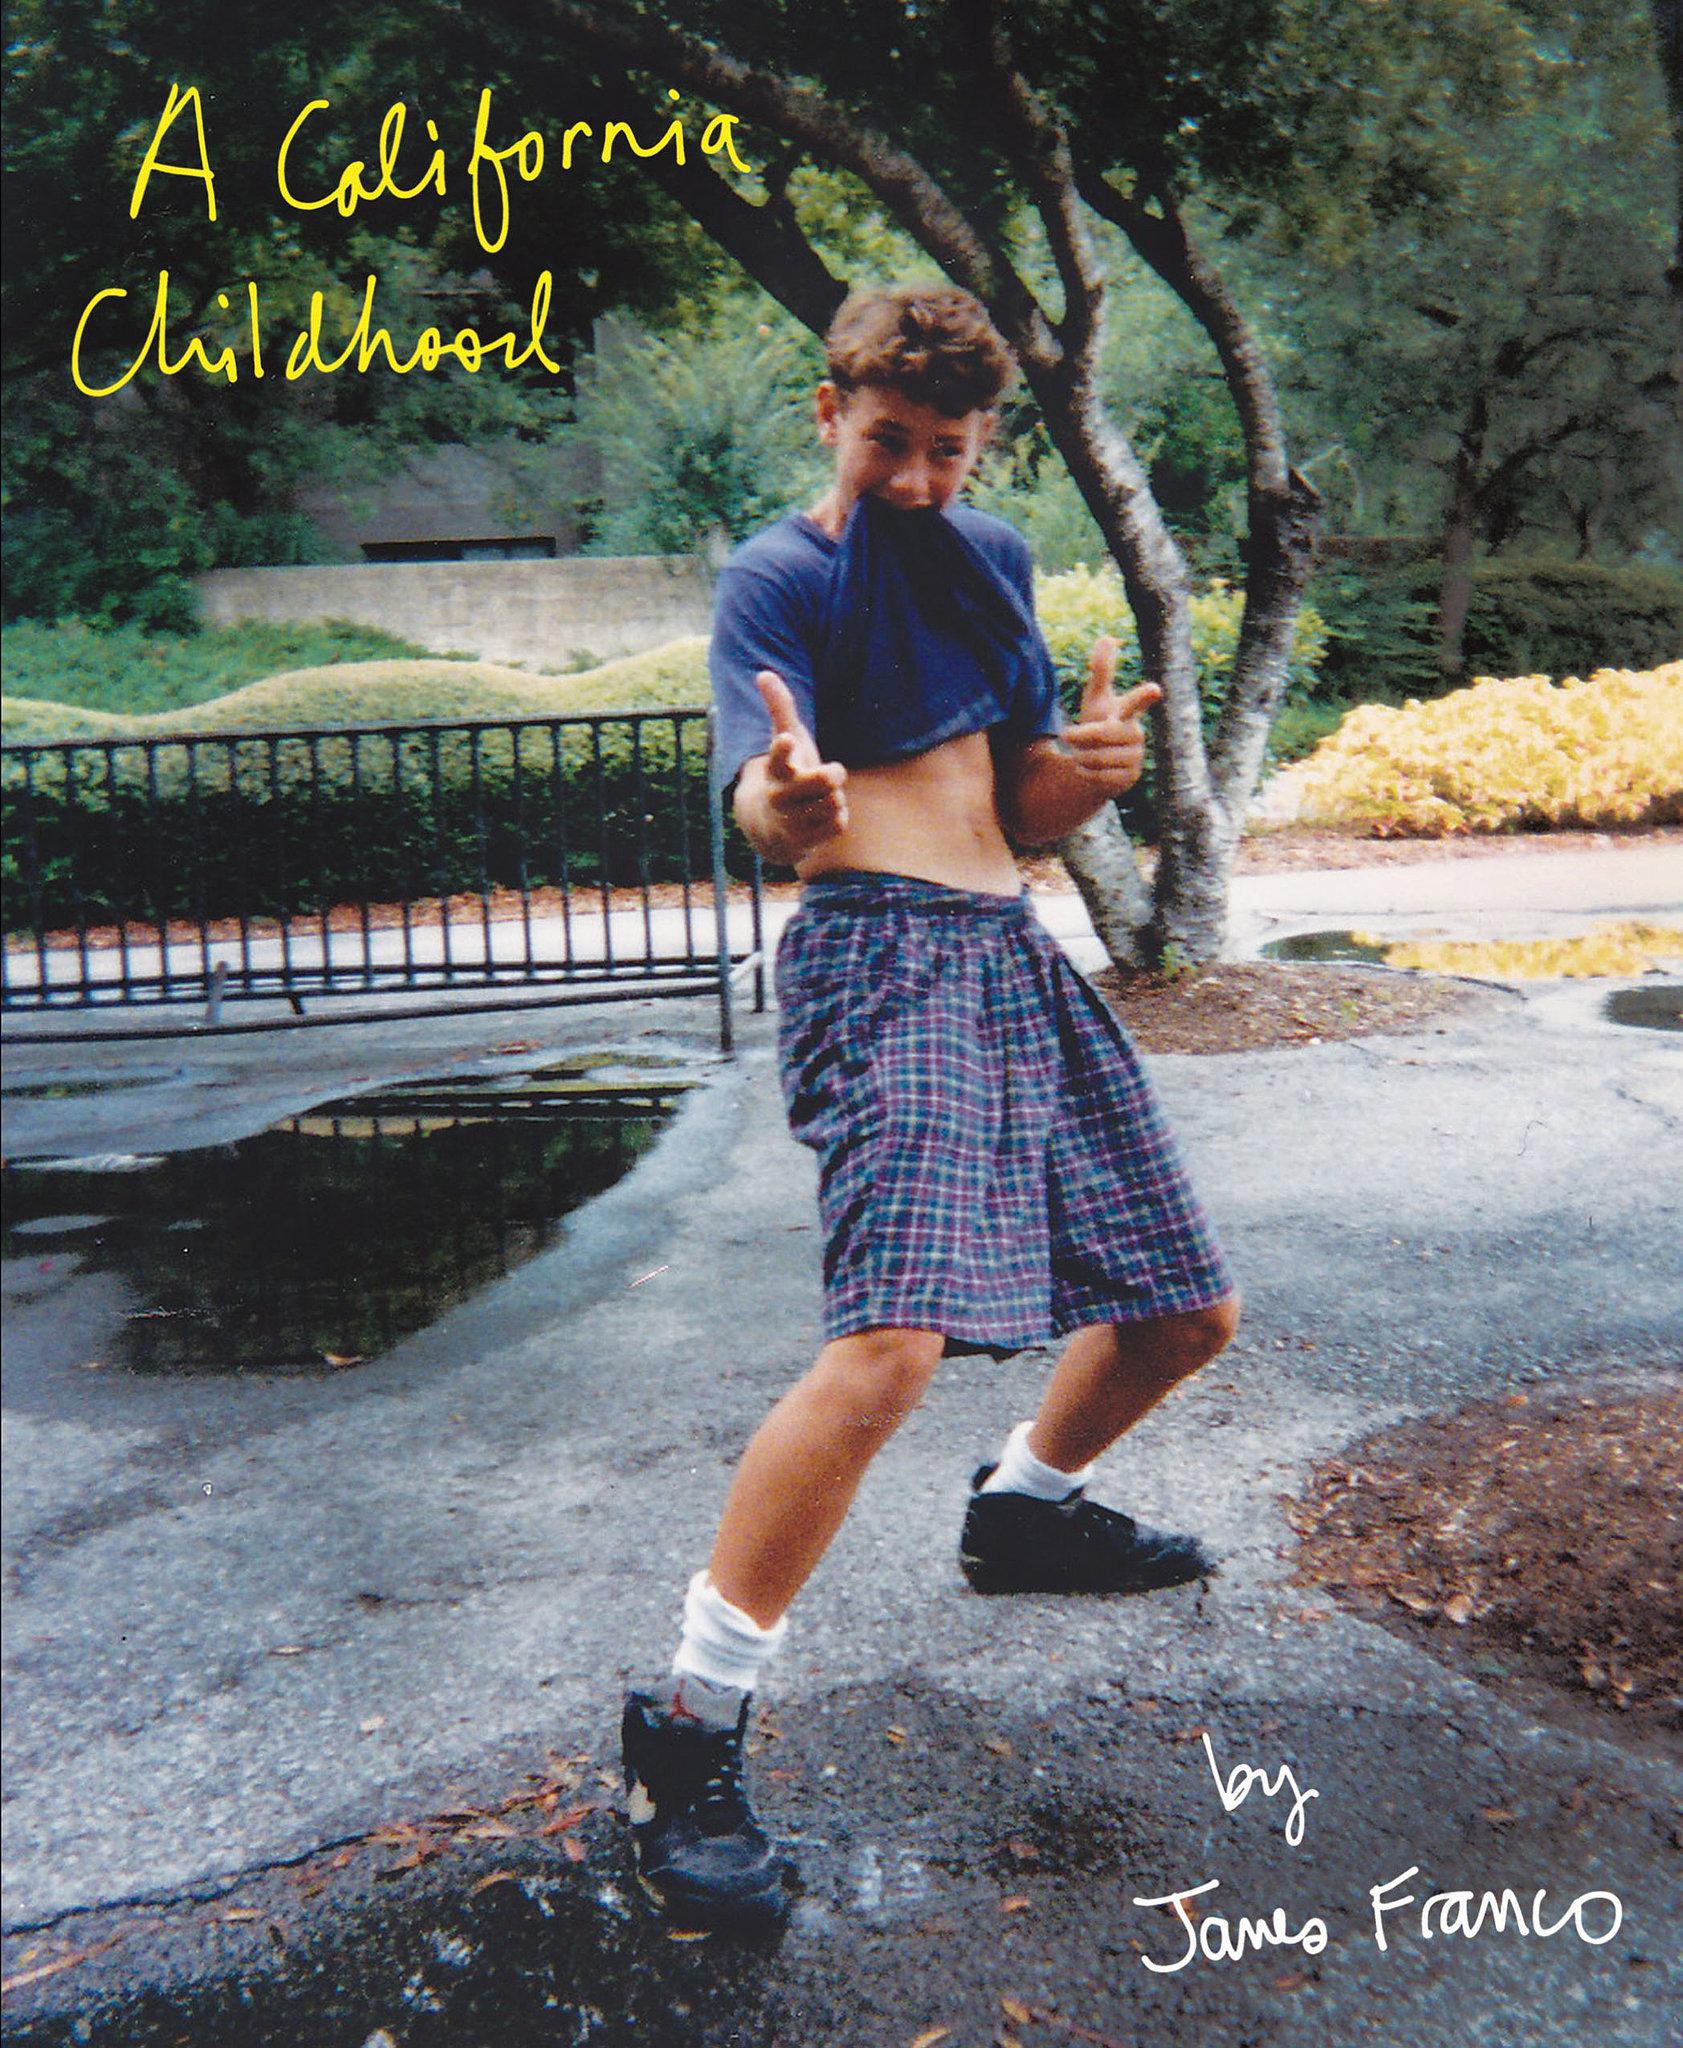 A California Childhood